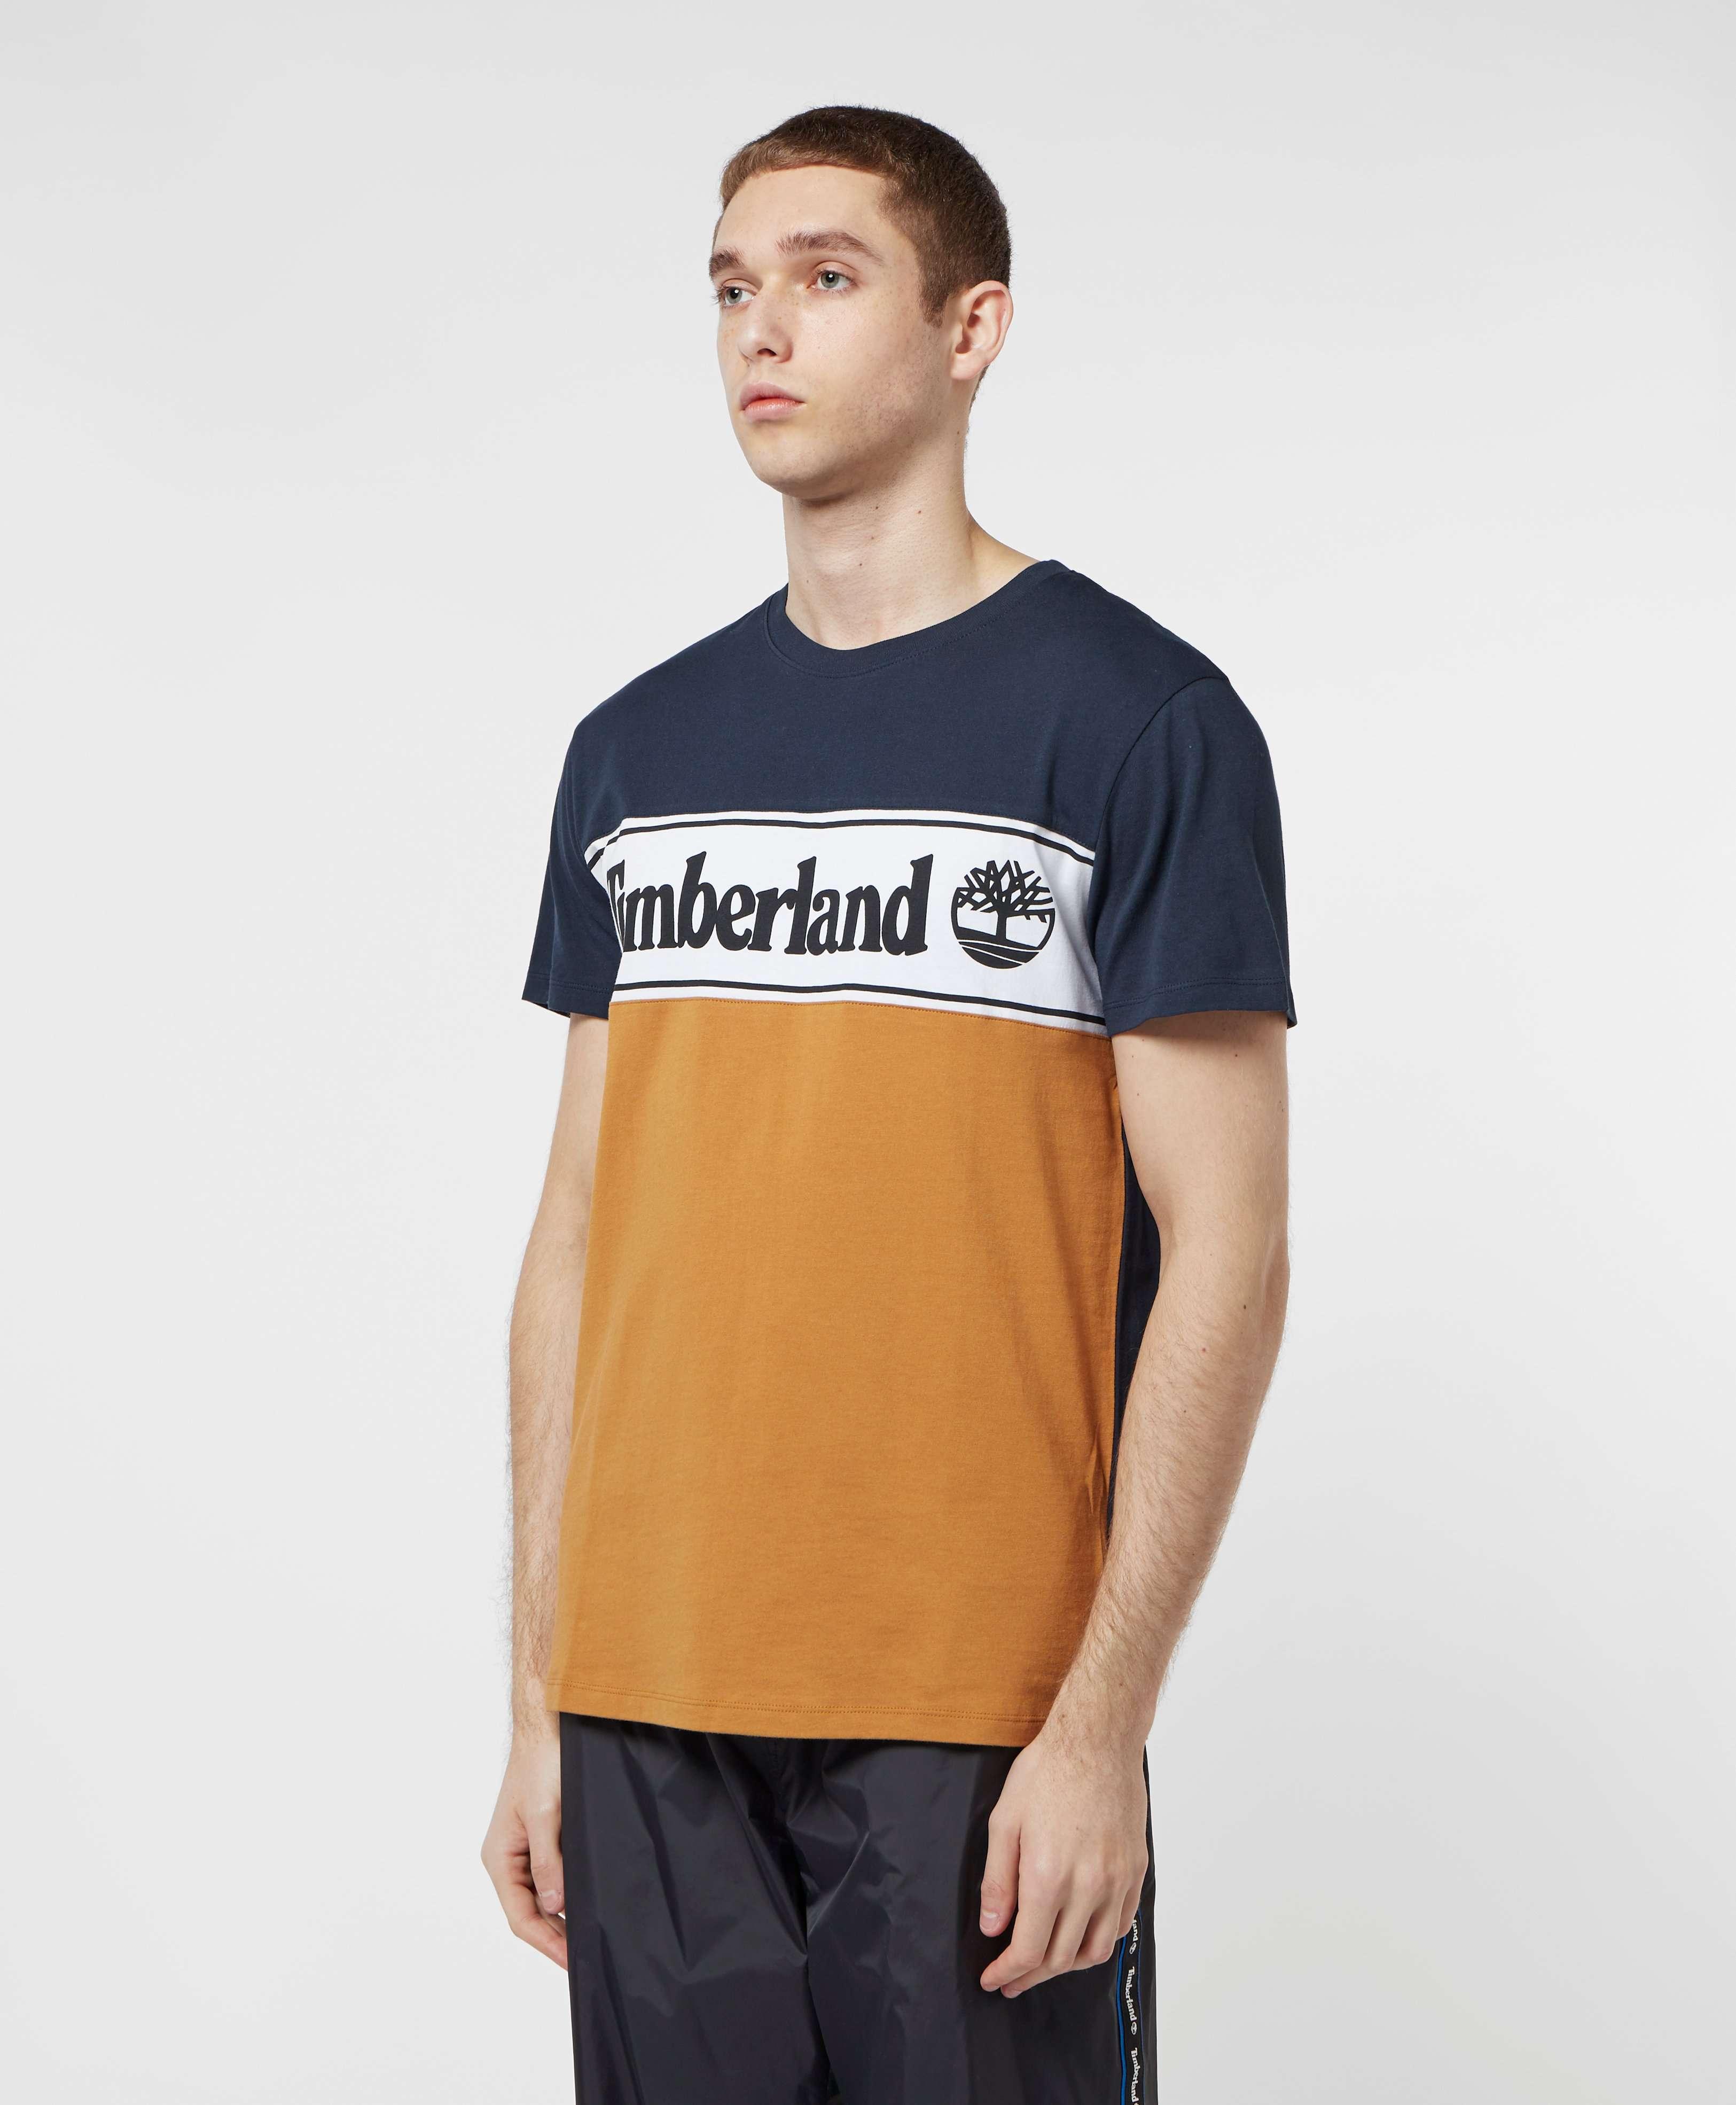 Timberland Chest Panel Short Sleeve T-Shirt